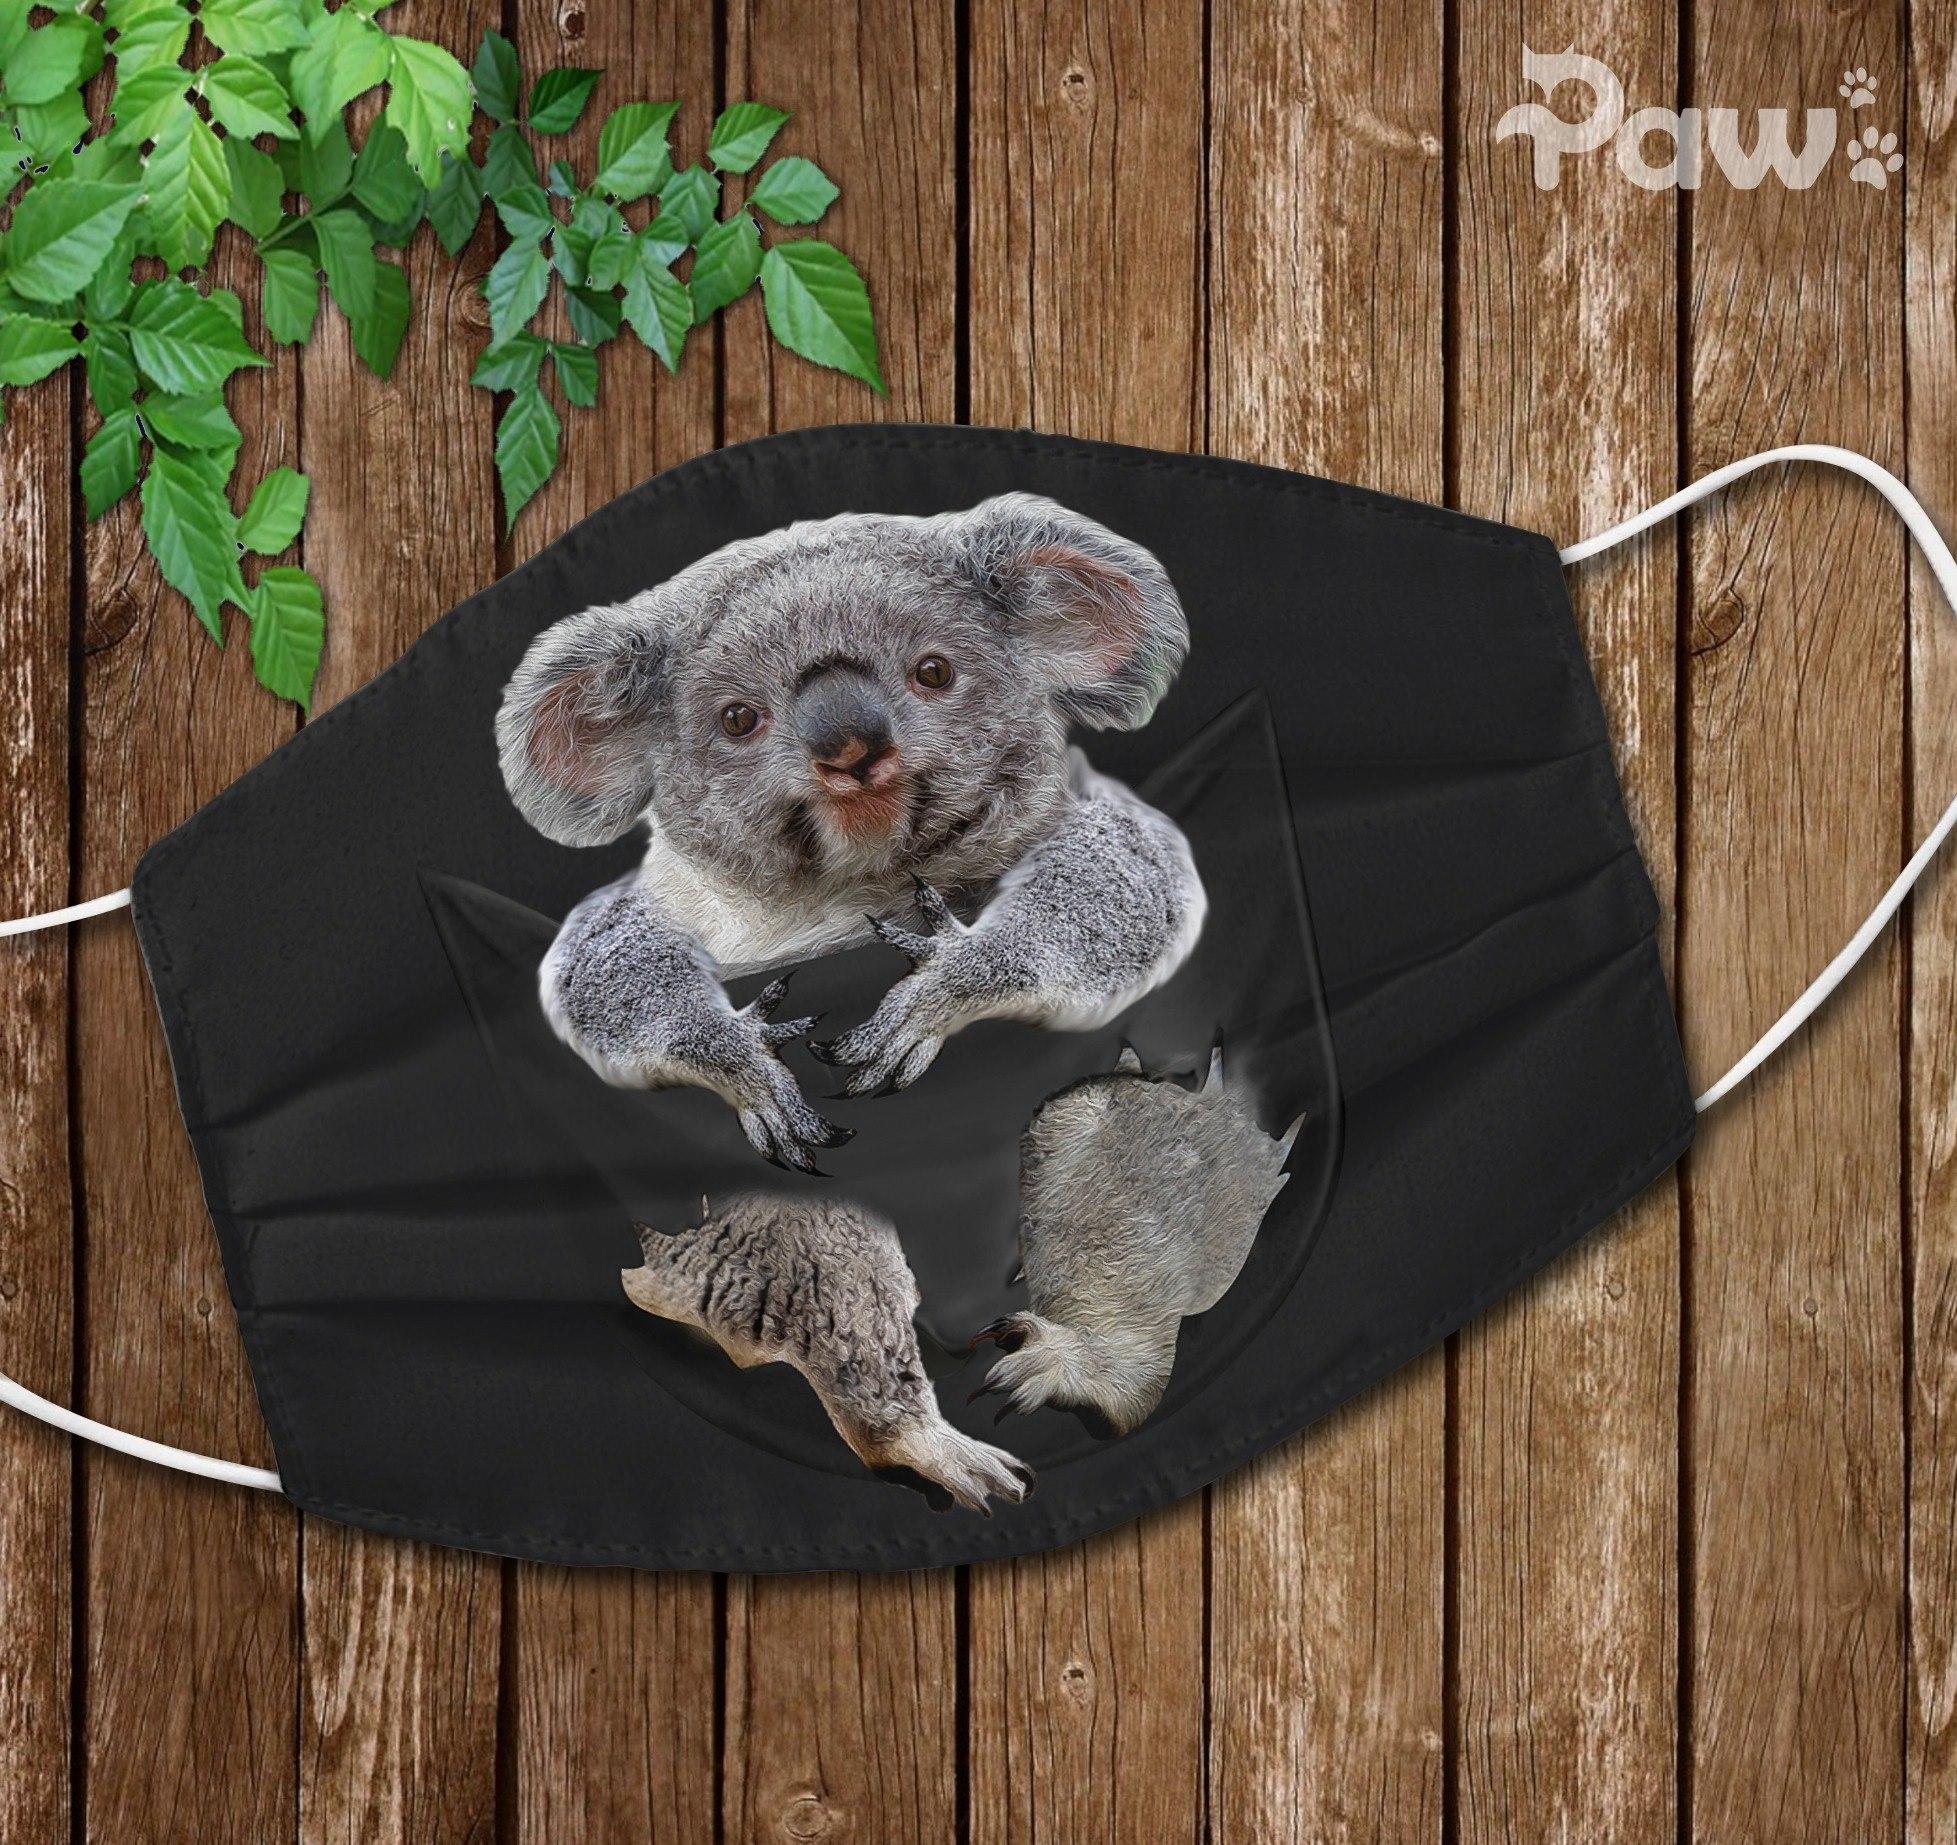 Cute Koala Face Mask - RobinPlaceFabrics